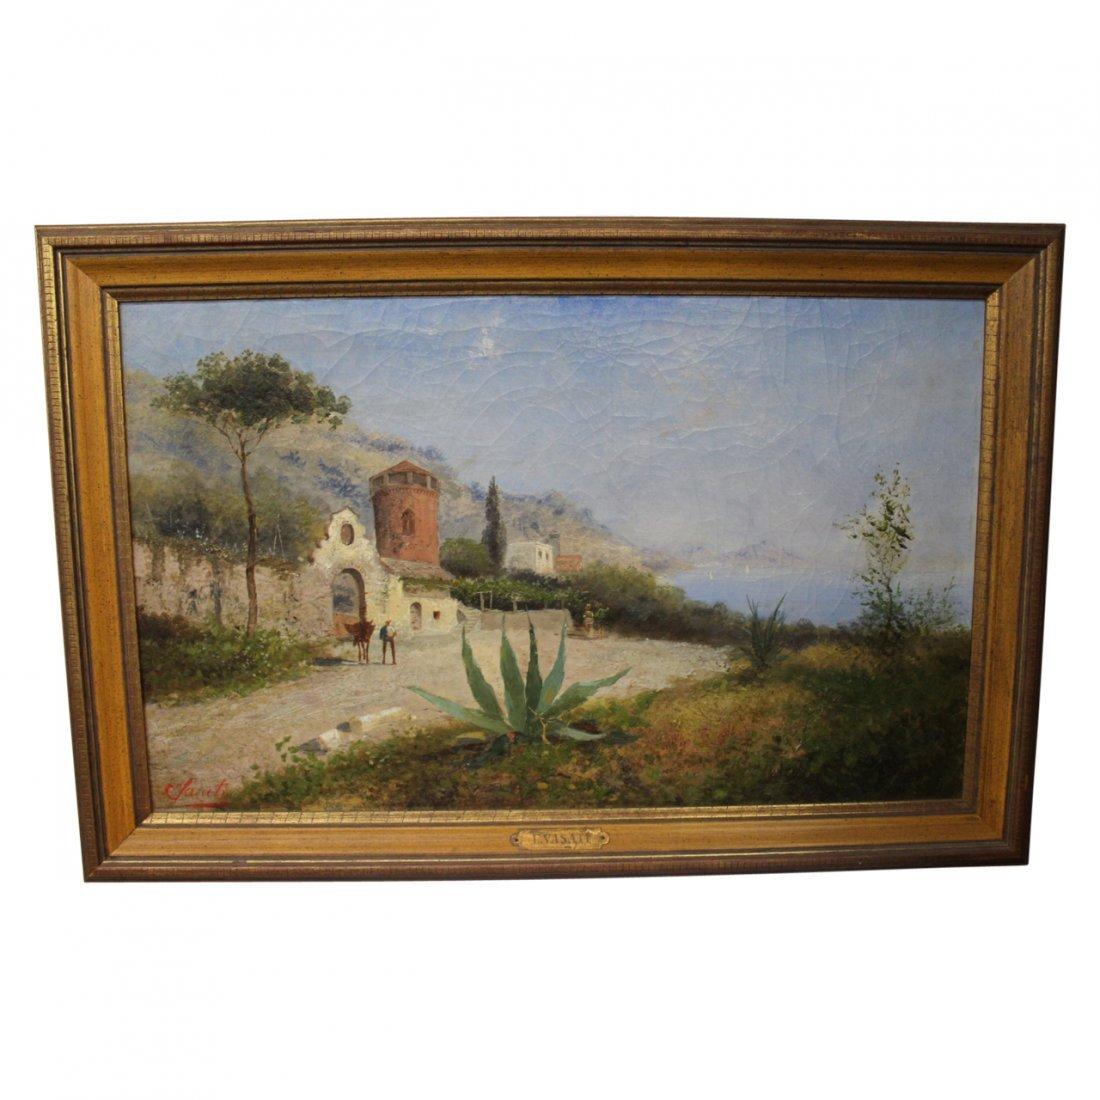 Antique Oil Painting By Vasati